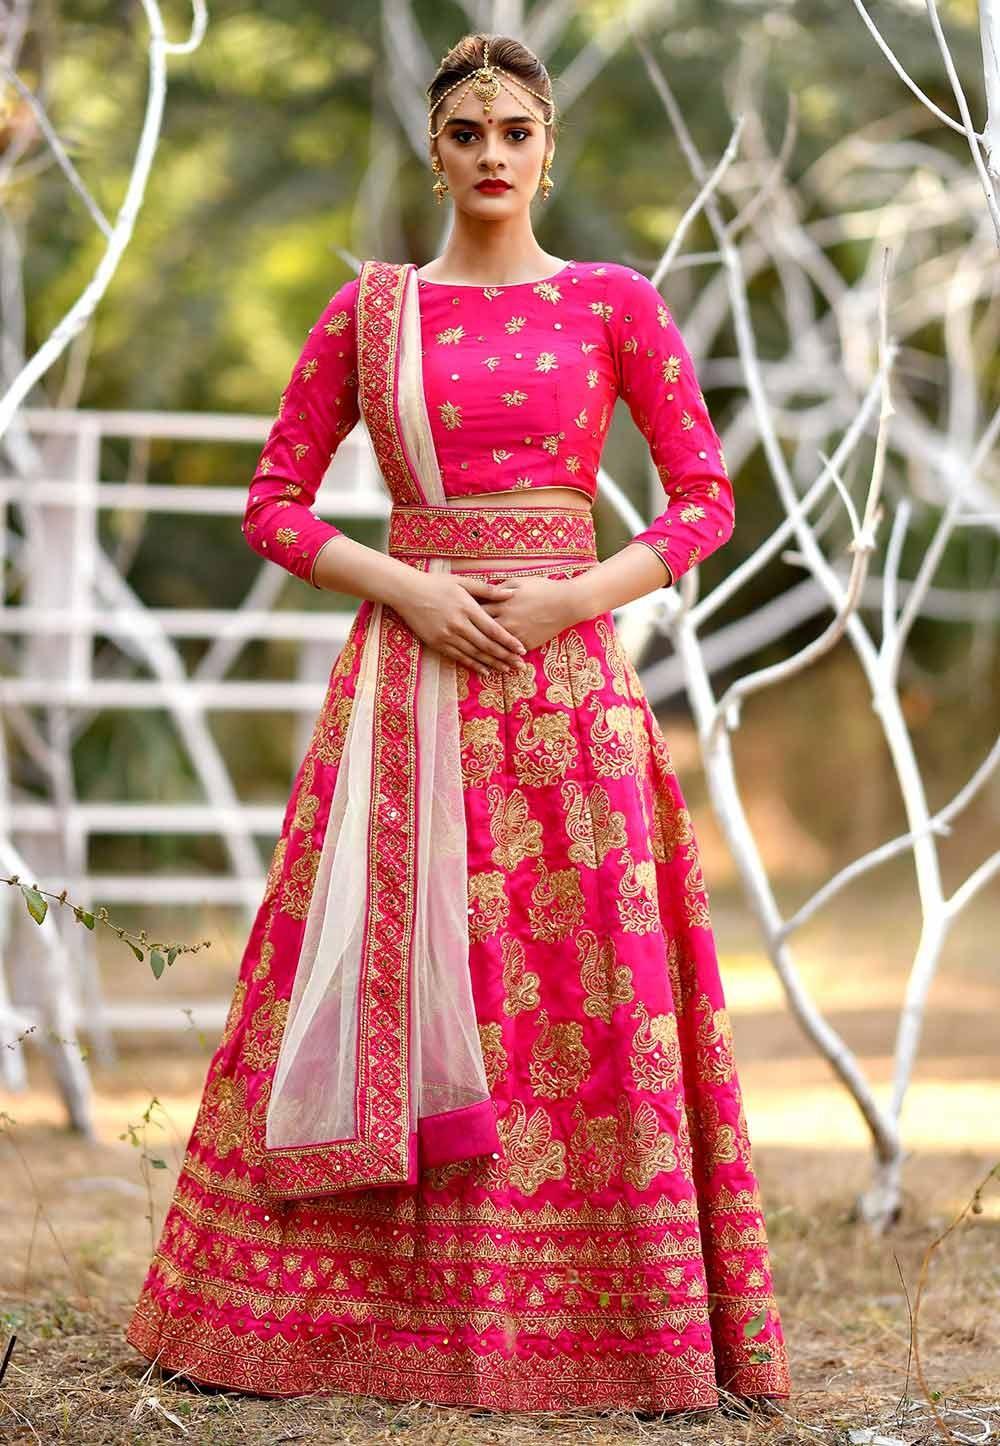 Pink Colour Indian Wedding Lehenga Choli.